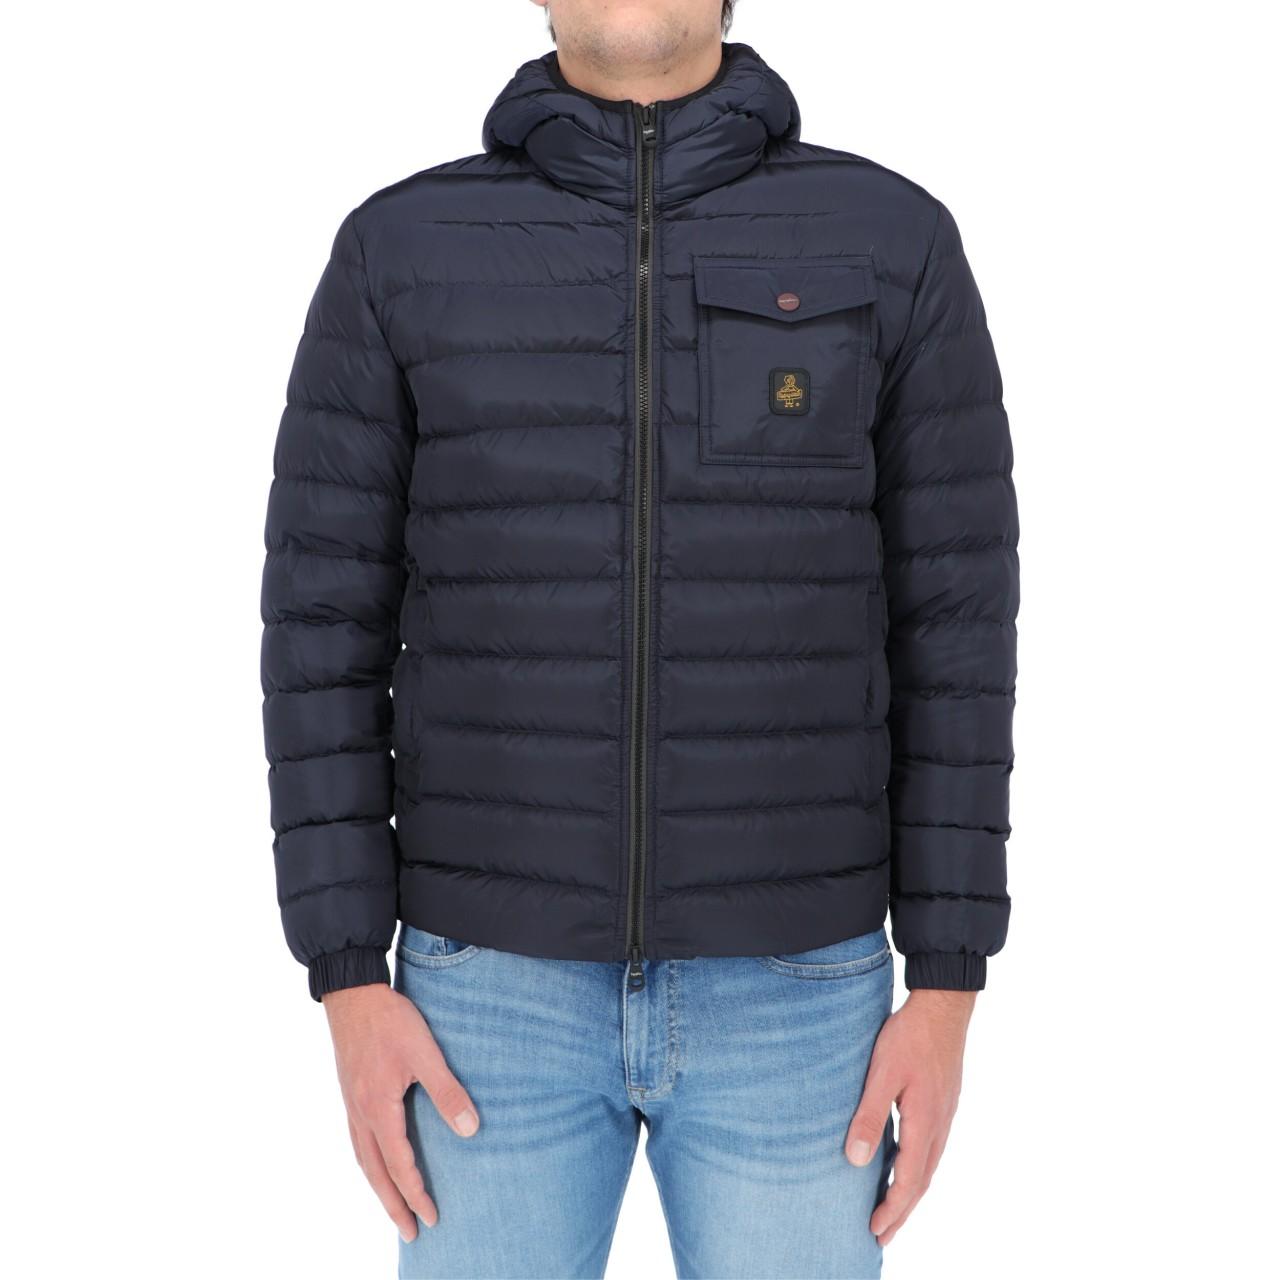 Refrigiwear Uomo Giacca Refrigiwear Uomo Piuma Cappuccio Hunter Jacket HUNTERQ